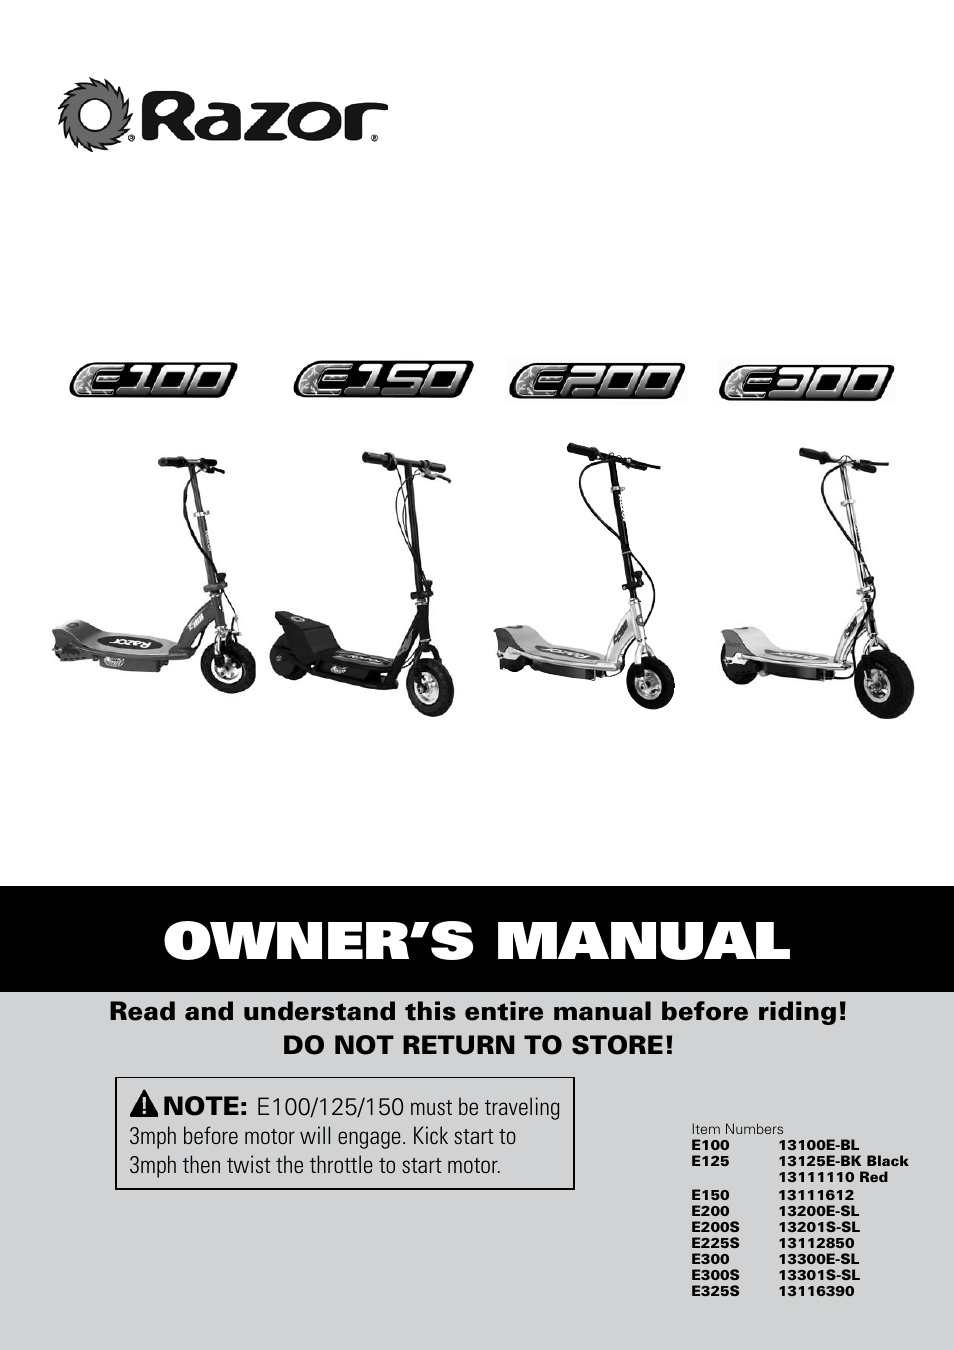 razor e300 user manual 24 pages also for e200 e150 e325s rh manualsdir com razor e200 electric scooter owners manual razor e200 electric scooter owners manual